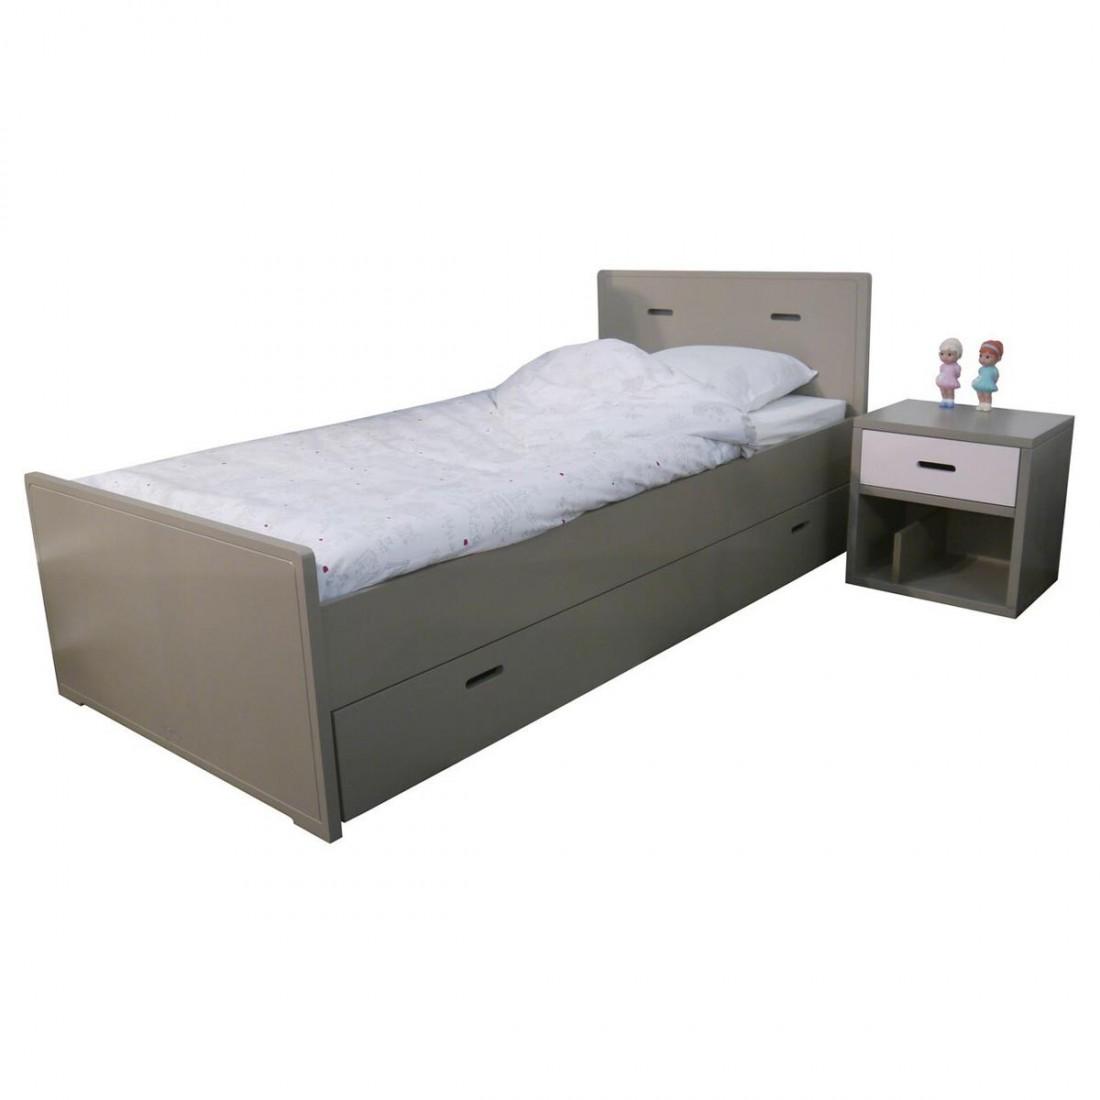 lit enfant junior madaket mathy by bols ma chambramoi. Black Bedroom Furniture Sets. Home Design Ideas